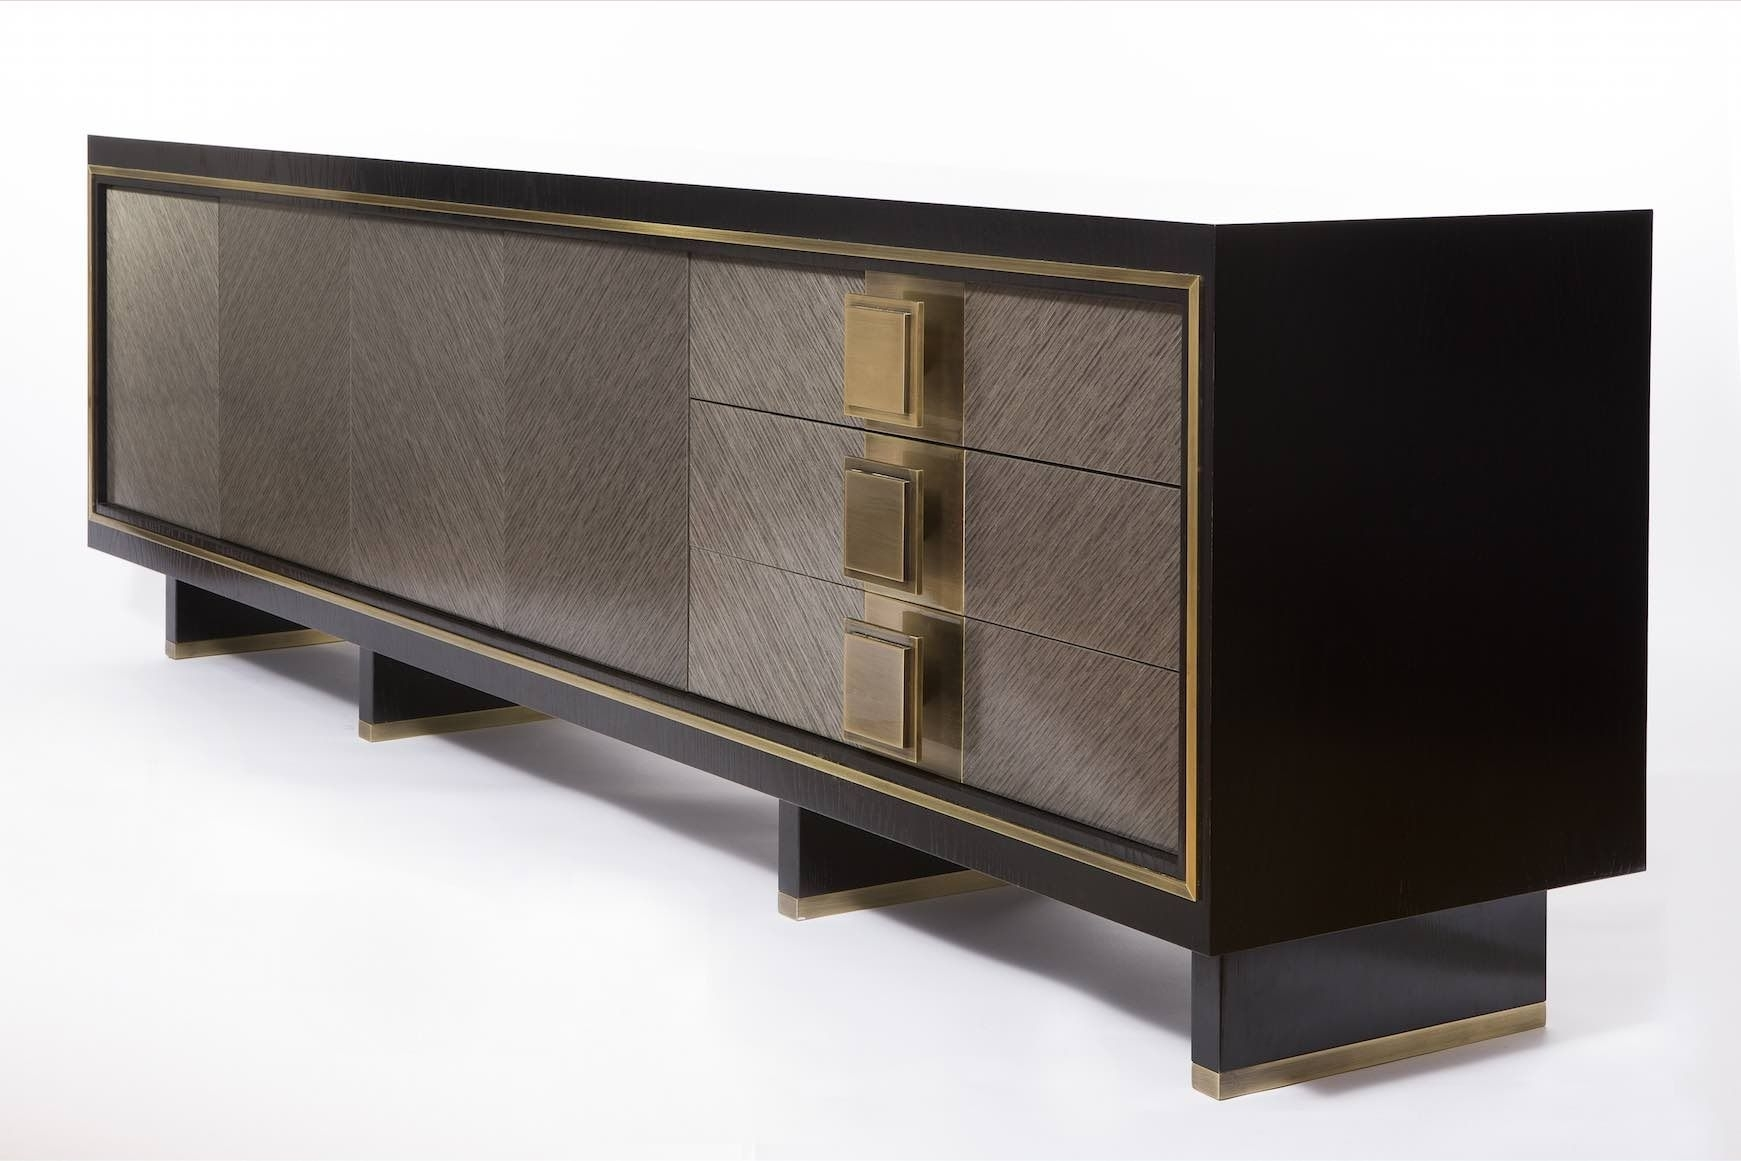 Luxury Sideboard. Grey And Dark Sideboard. Golden Details. Luxury regarding Rani 4 Door Sideboards (Image 12 of 30)